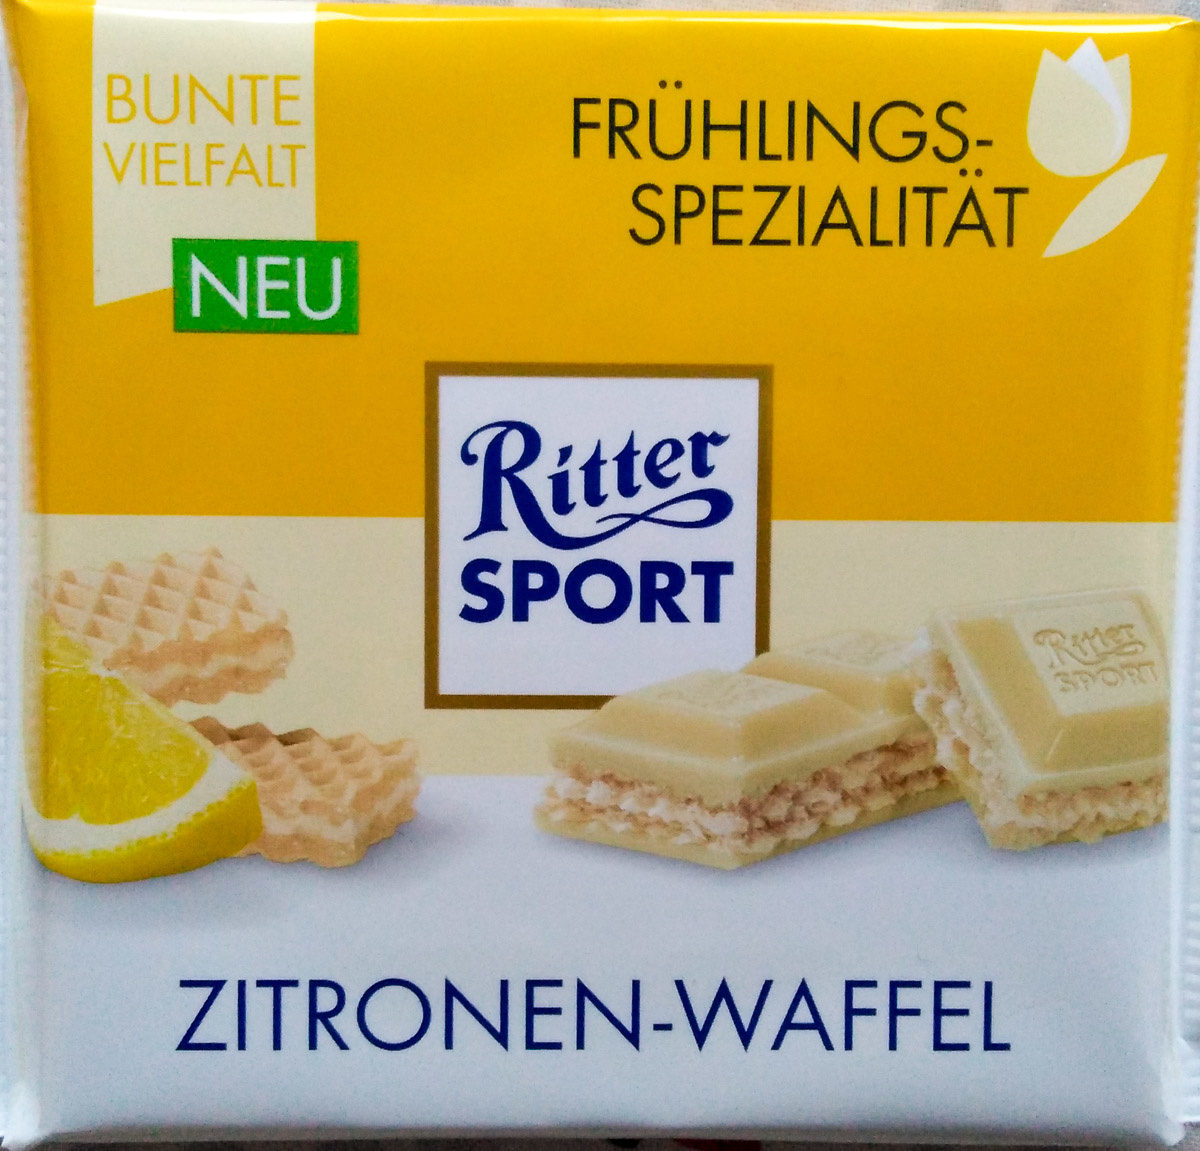 Zitronen-Waffel - Product - de